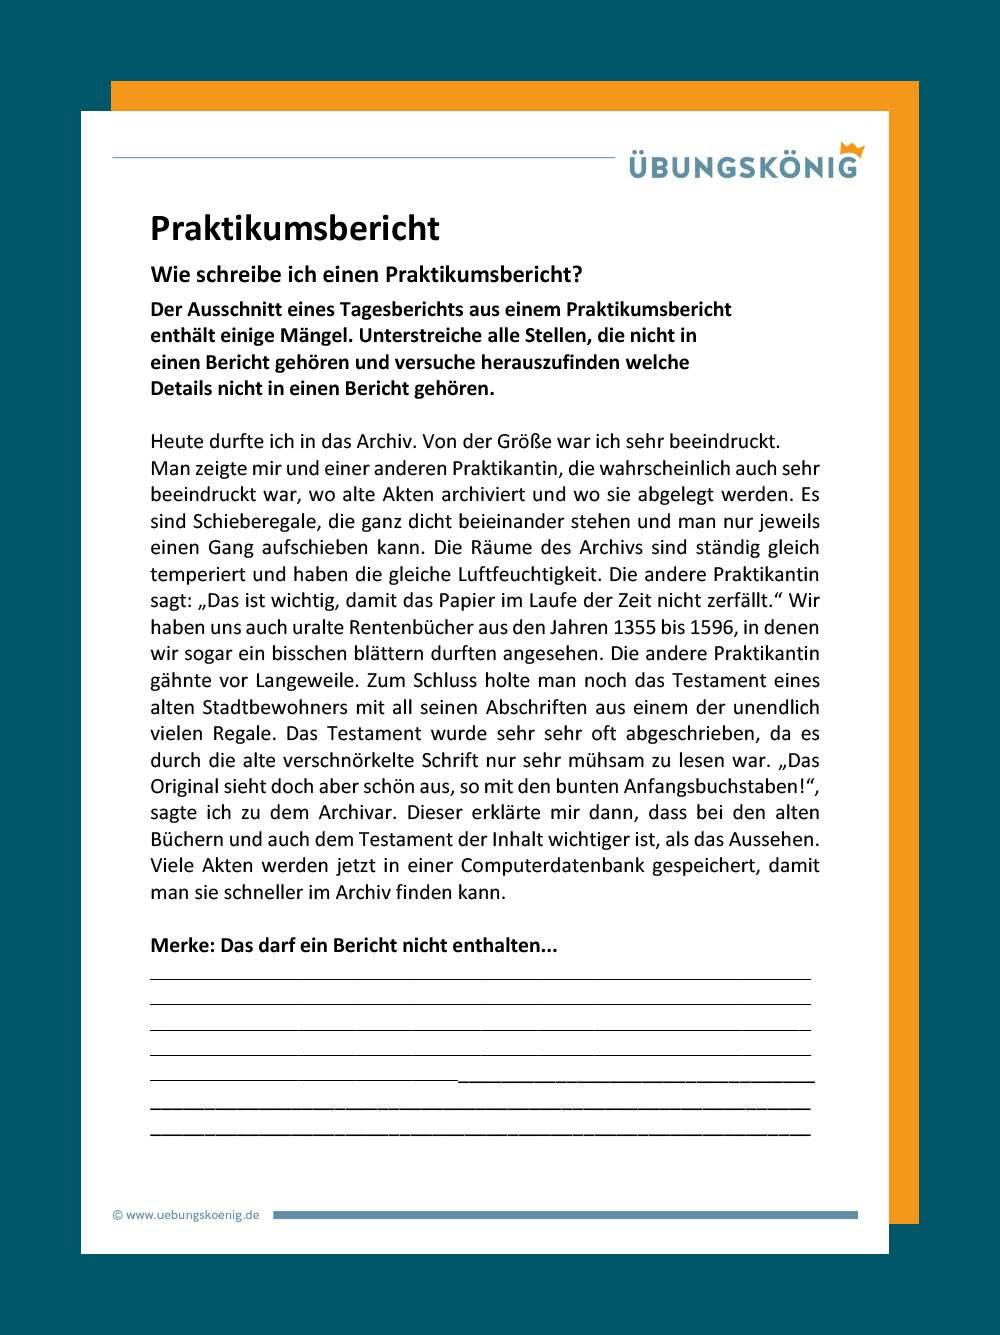 Deckblatt Praktikumsbericht Zum Betriebspraktikum 8